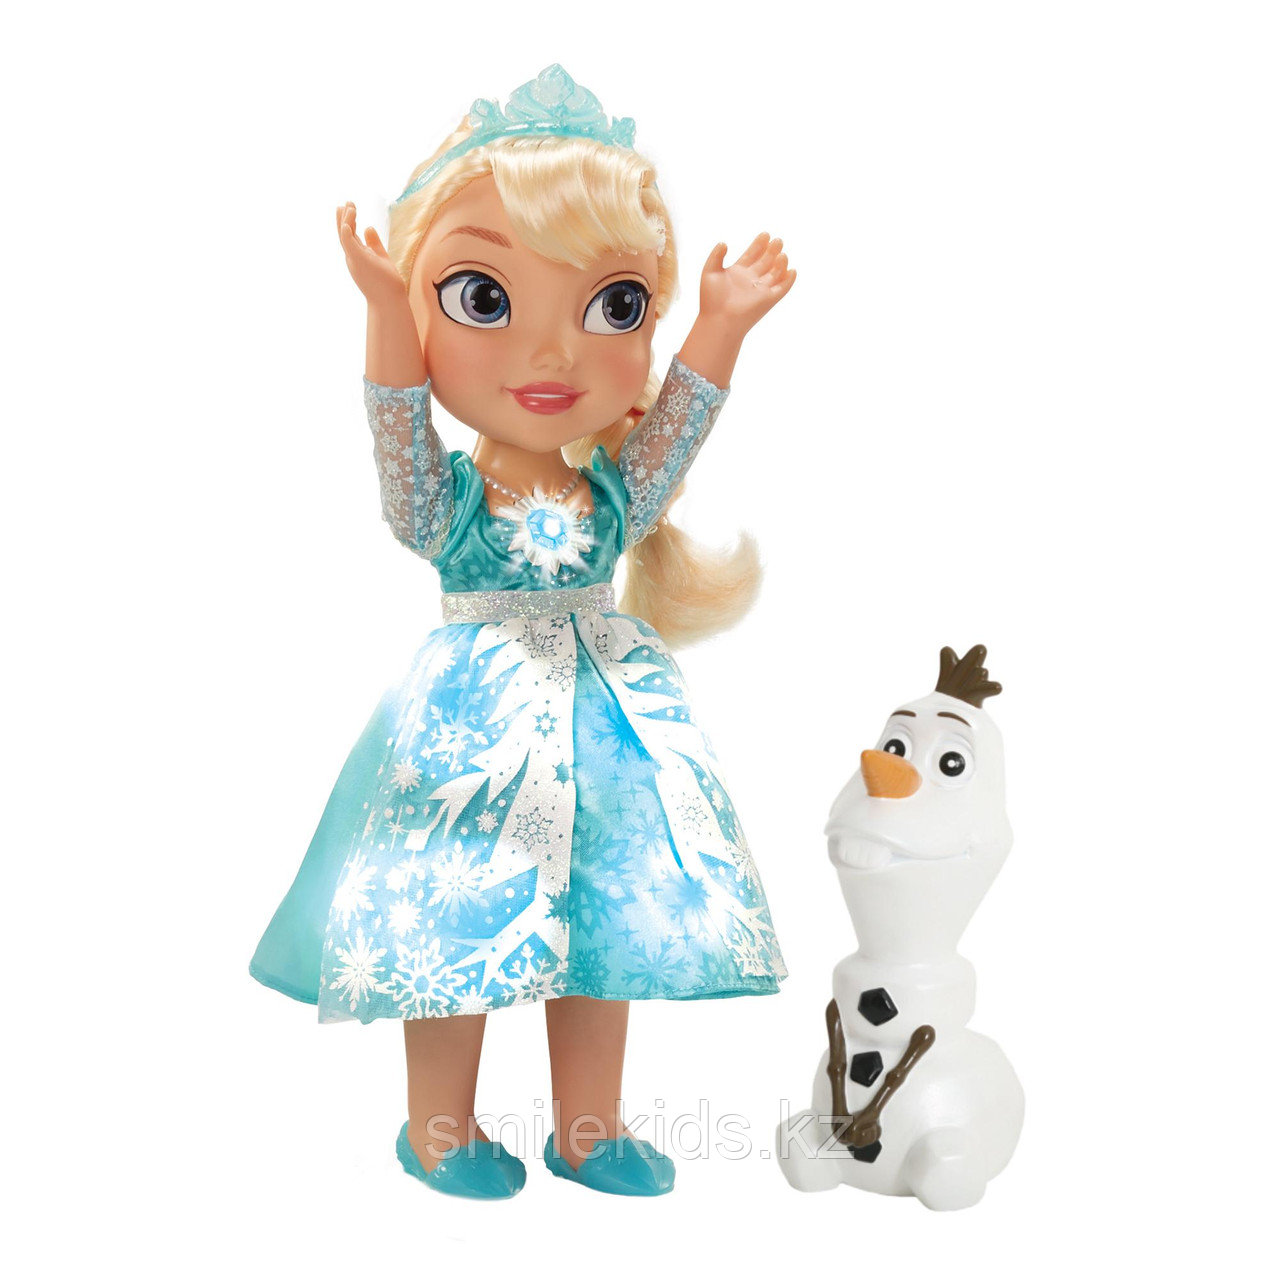 Кукла Эльза Холодное Сердце